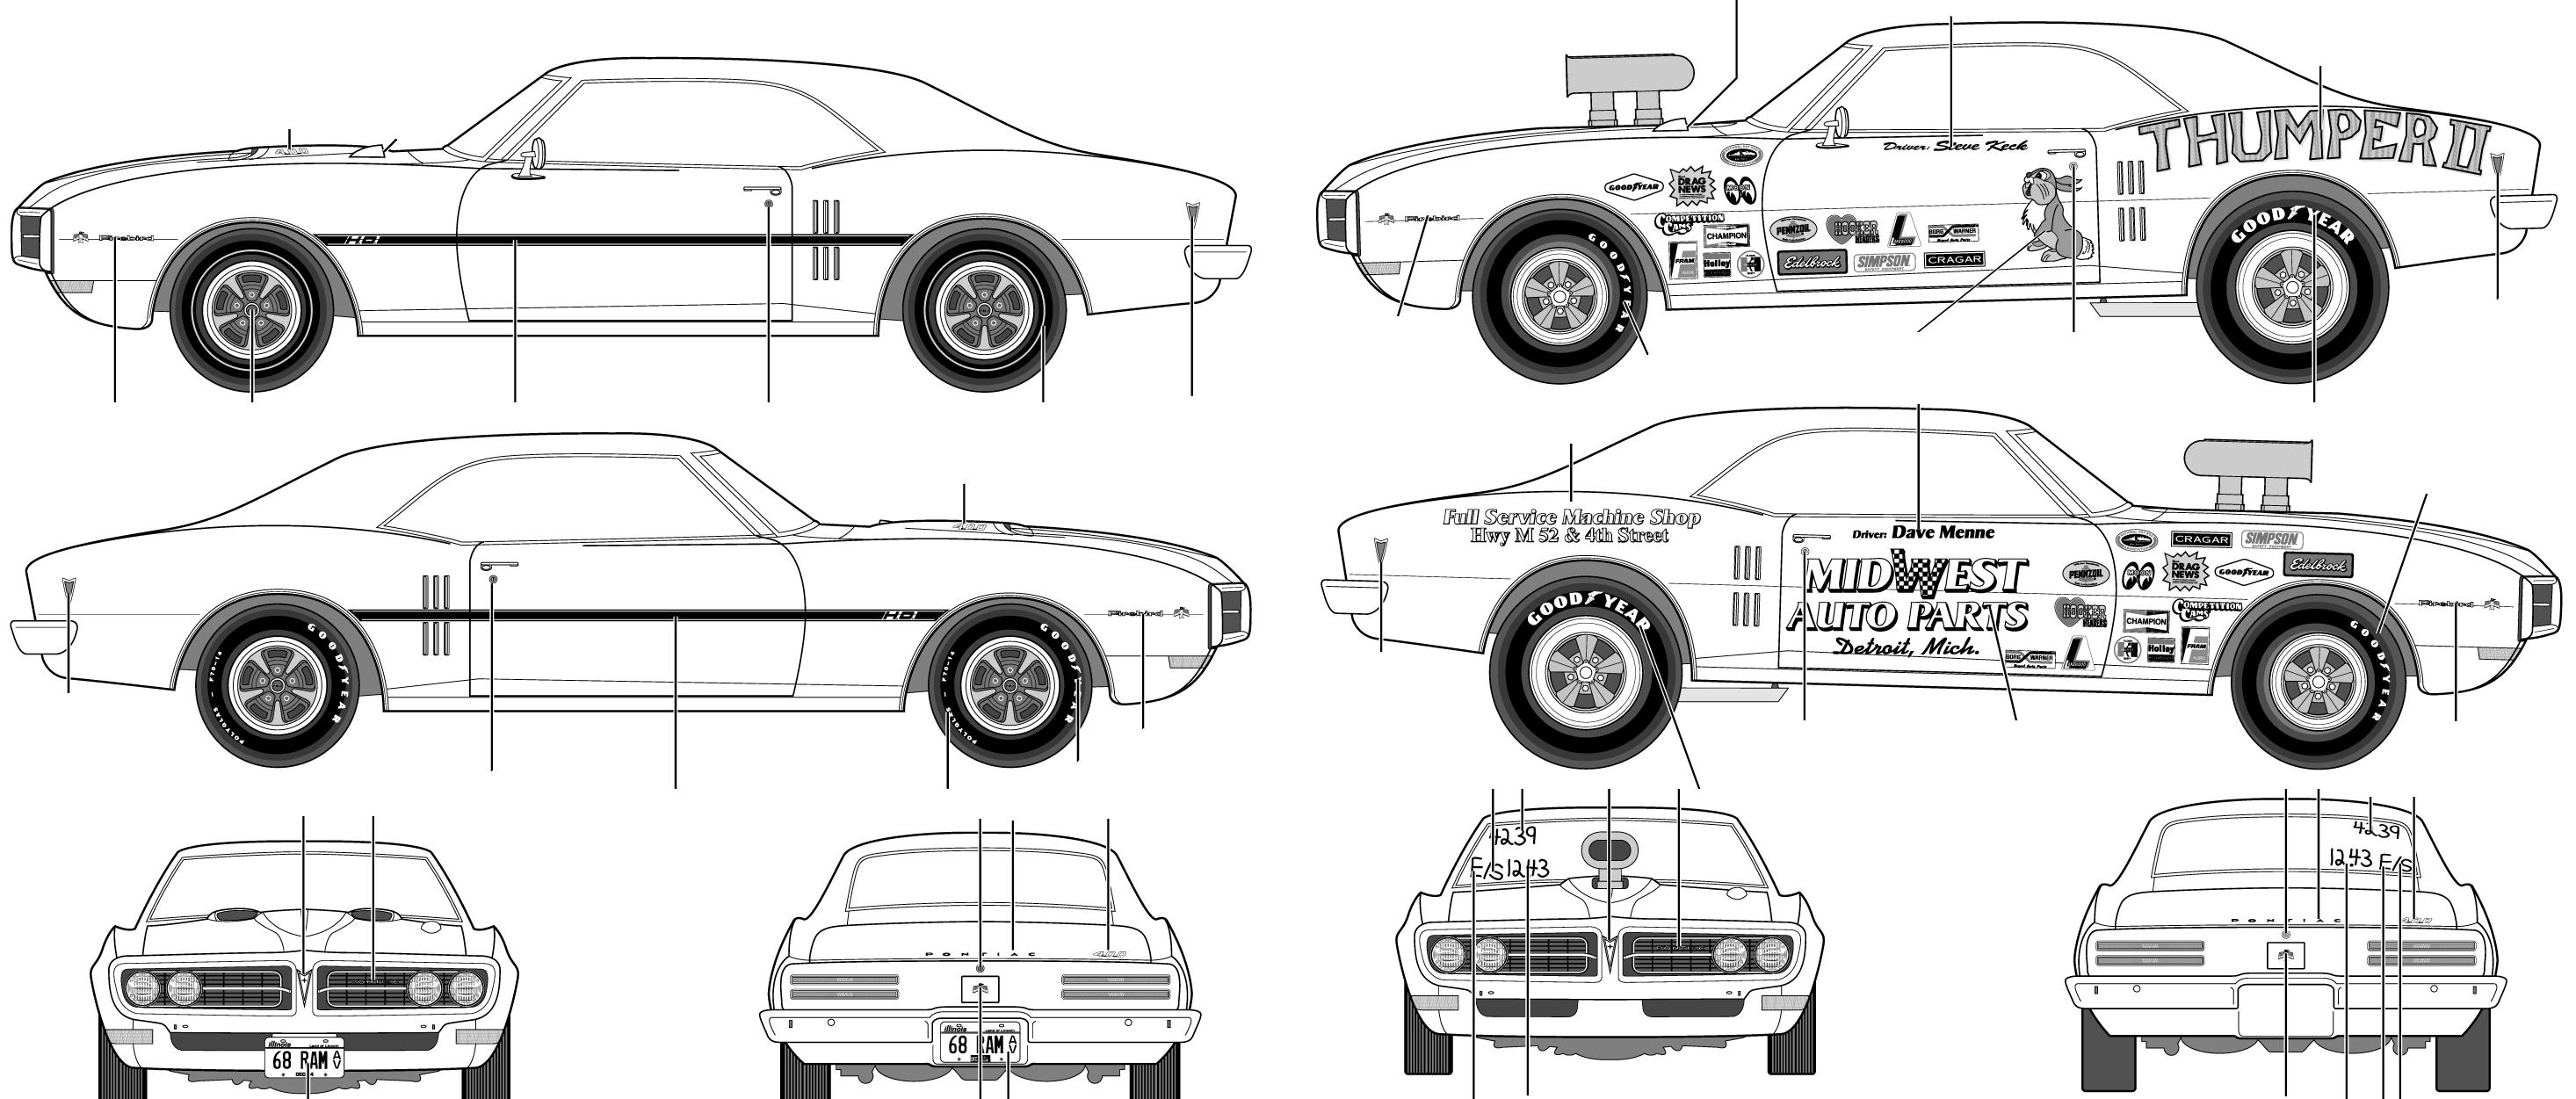 1968 pontiac firebird 400 ram air coupe blueprints free outlines pontiac firebird 400 ram air blueprints malvernweather Choice Image